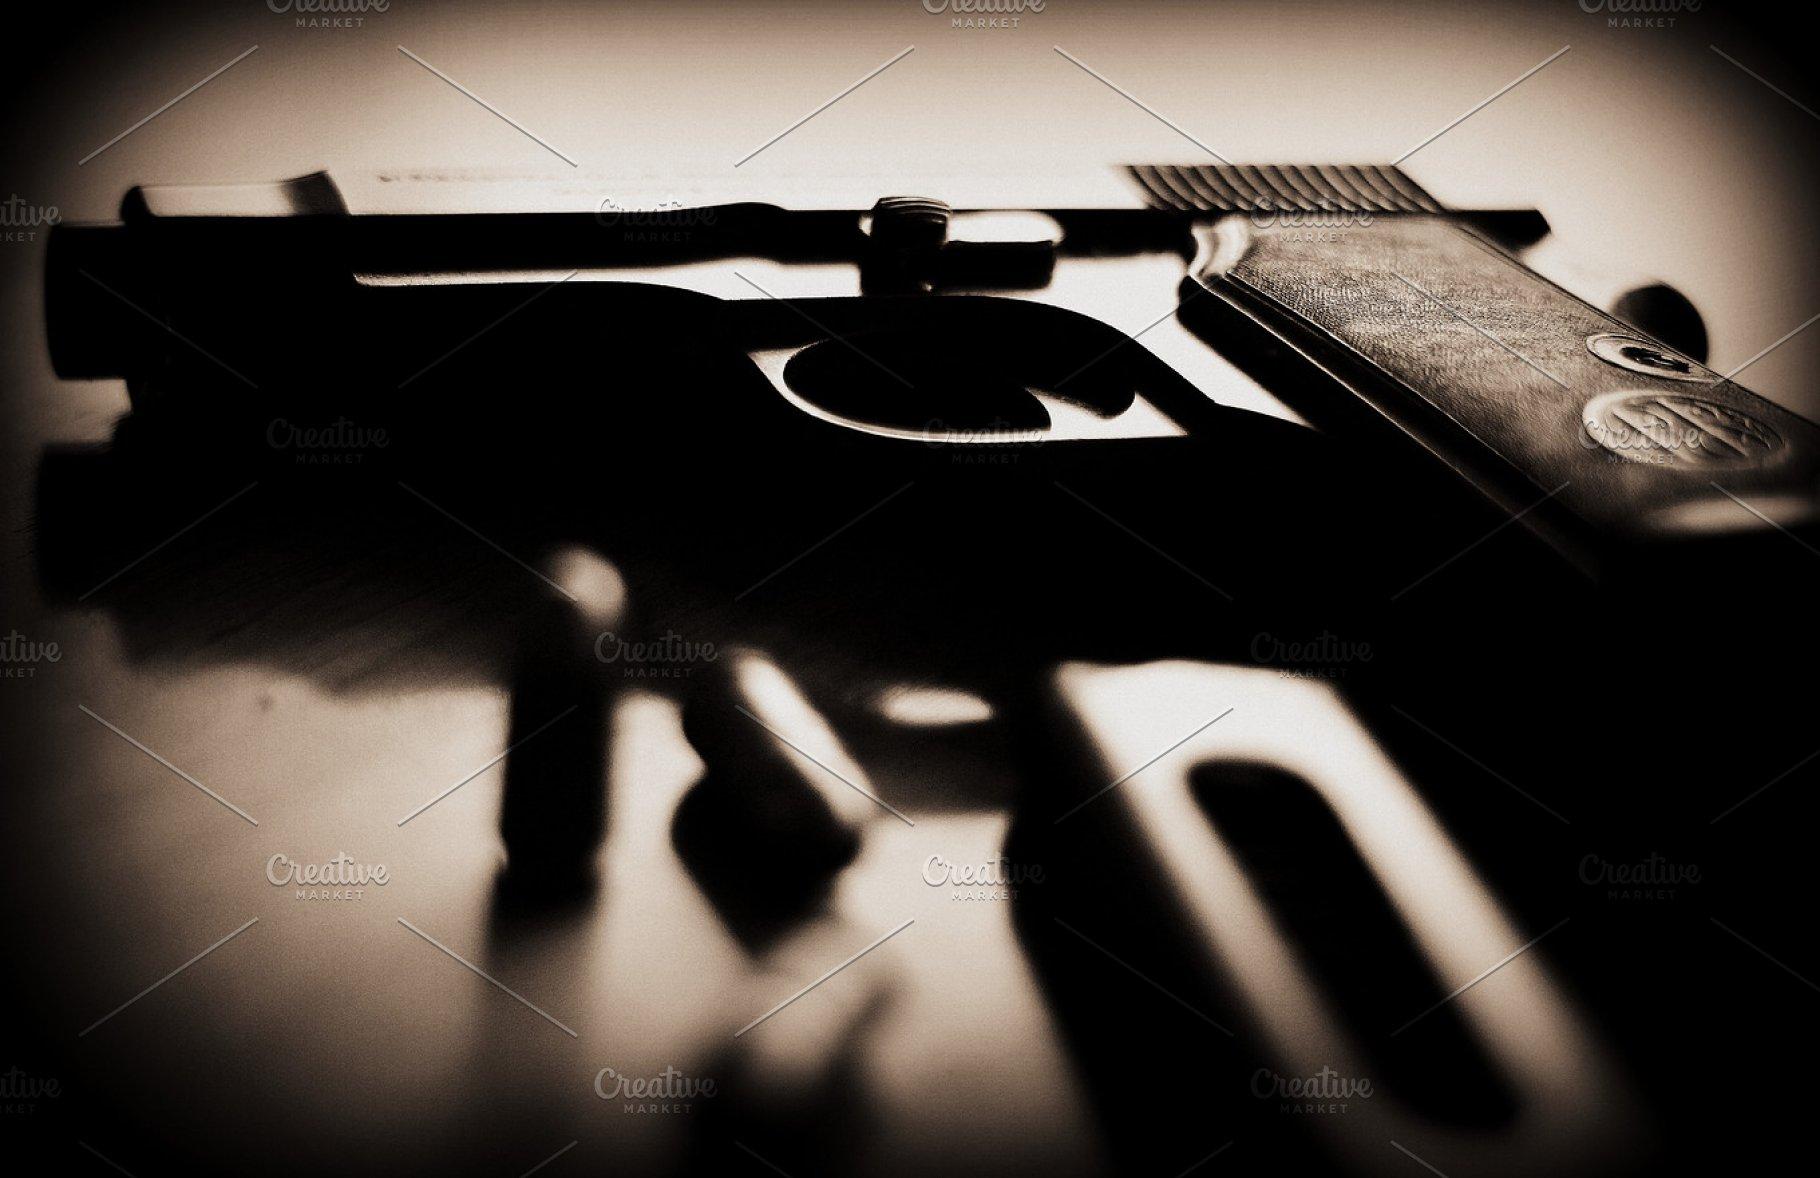 Gun, Bullet, and a Magazine